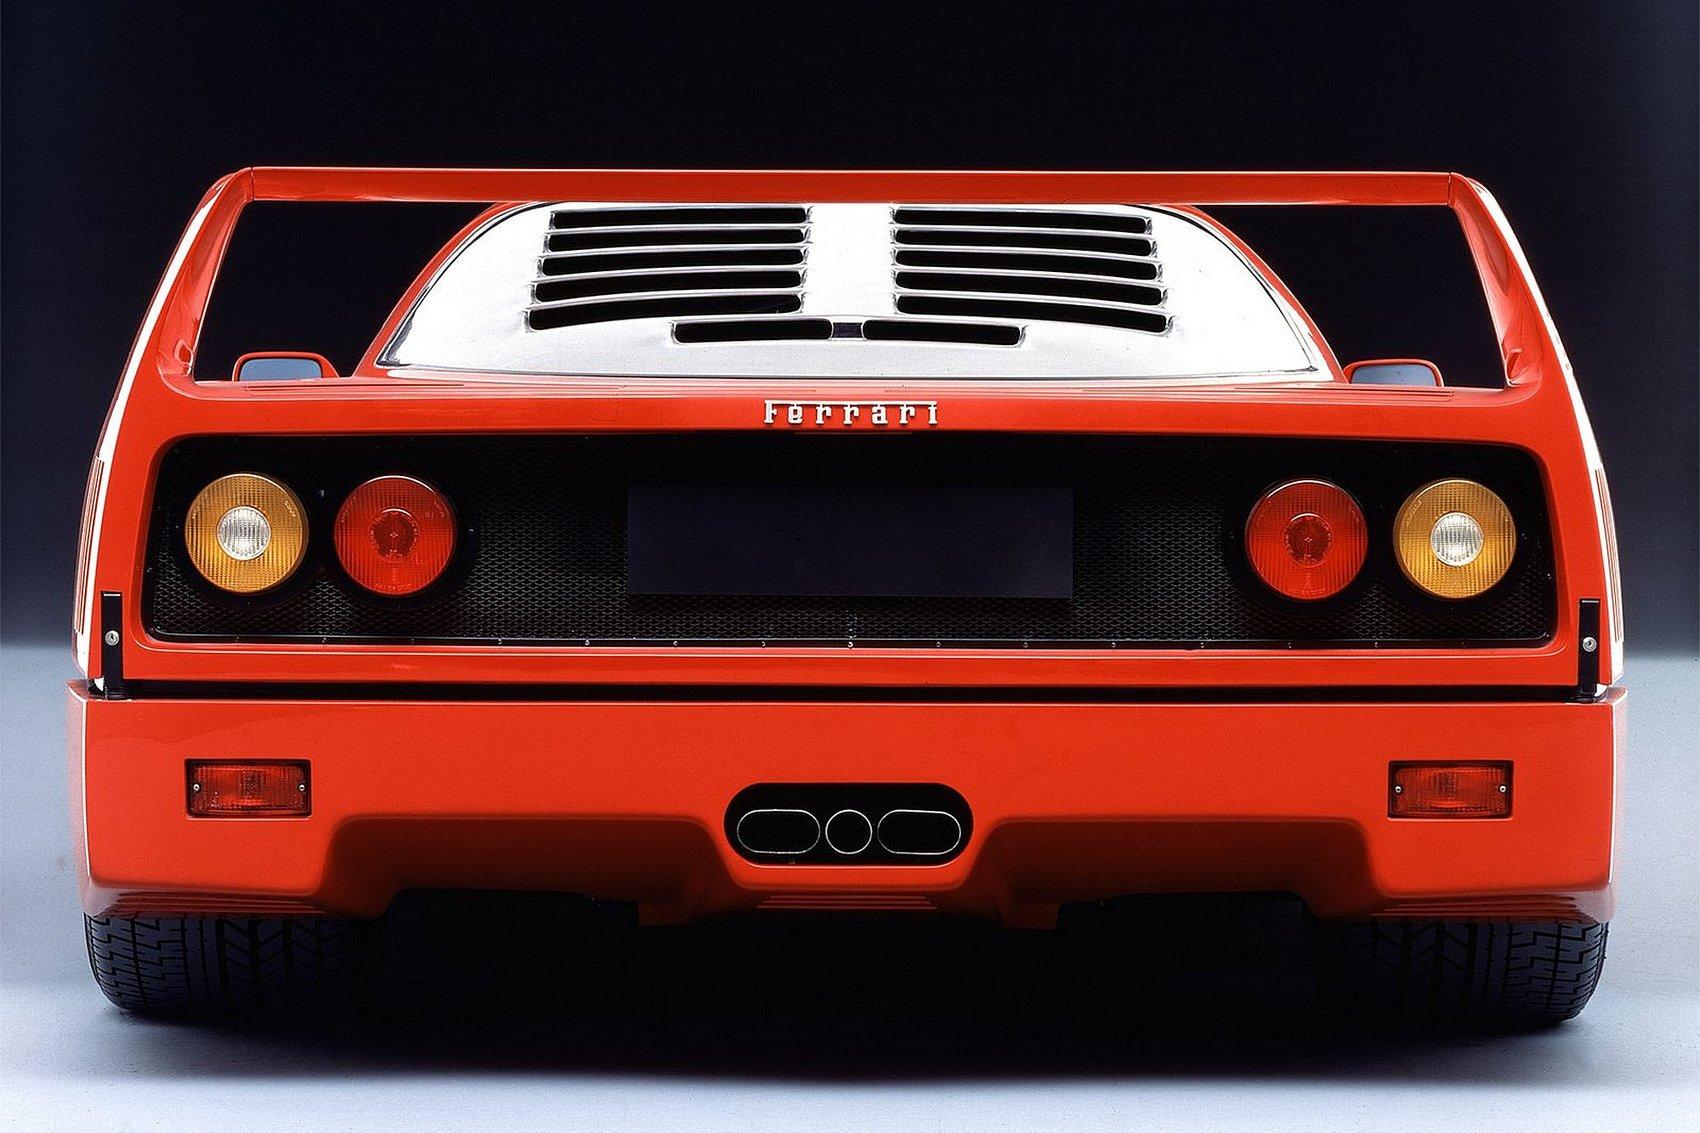 Ferrari_F40_ruoteclassiche-4